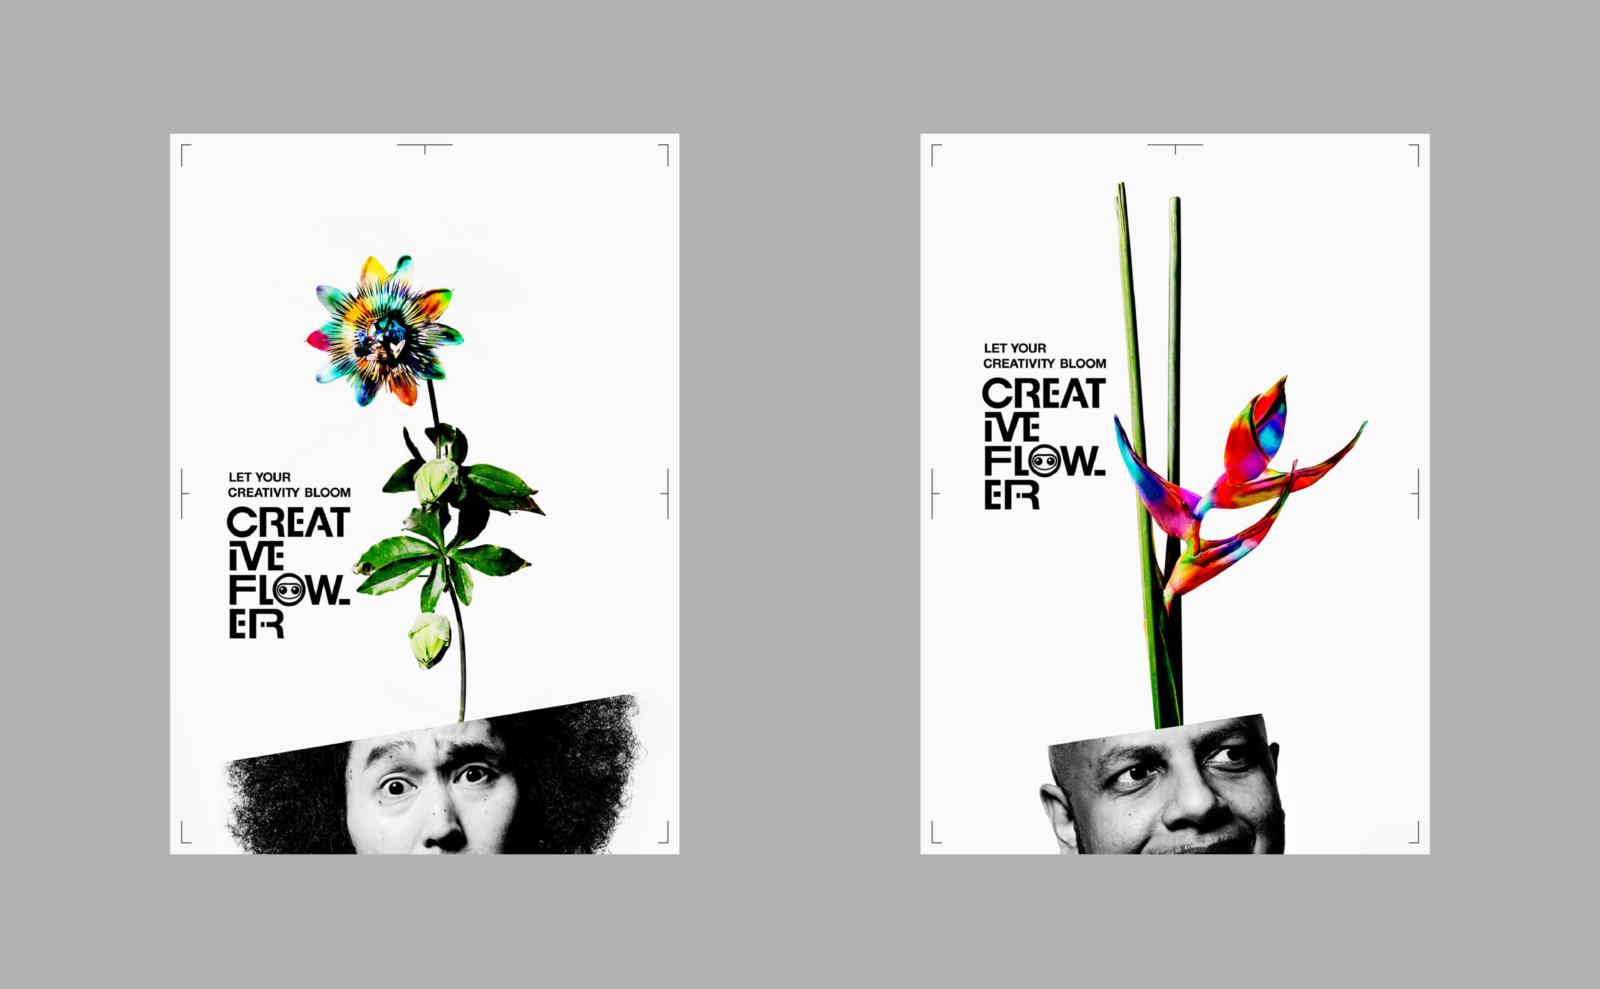 CREATIVE FLOW_ER__-6